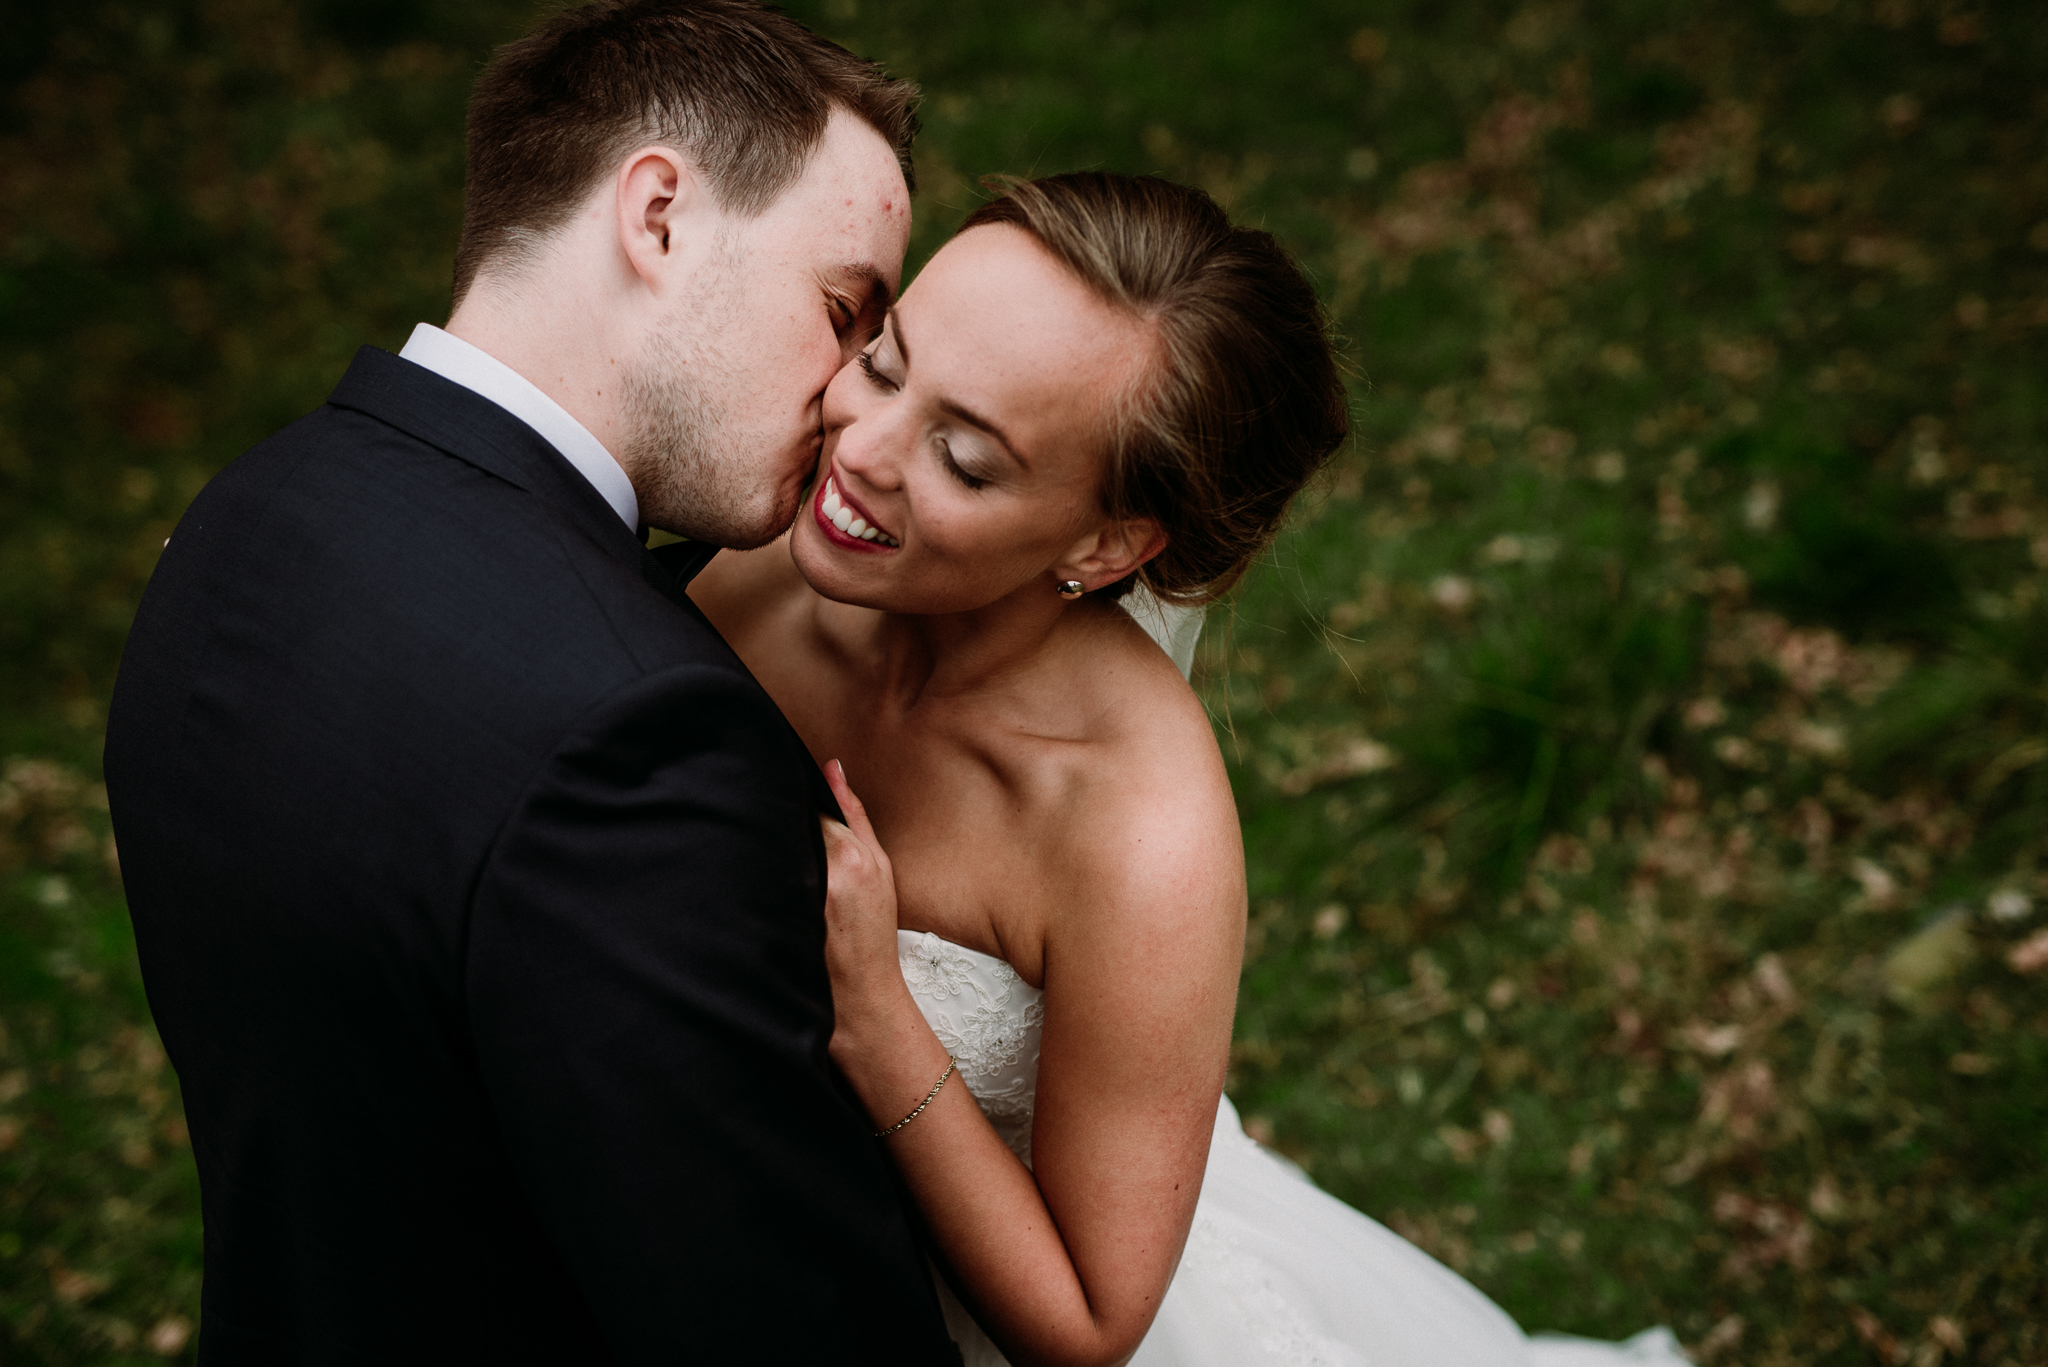 Bryllup i løen på Sunde. Bryllupsfotograf Petrichor and Pine